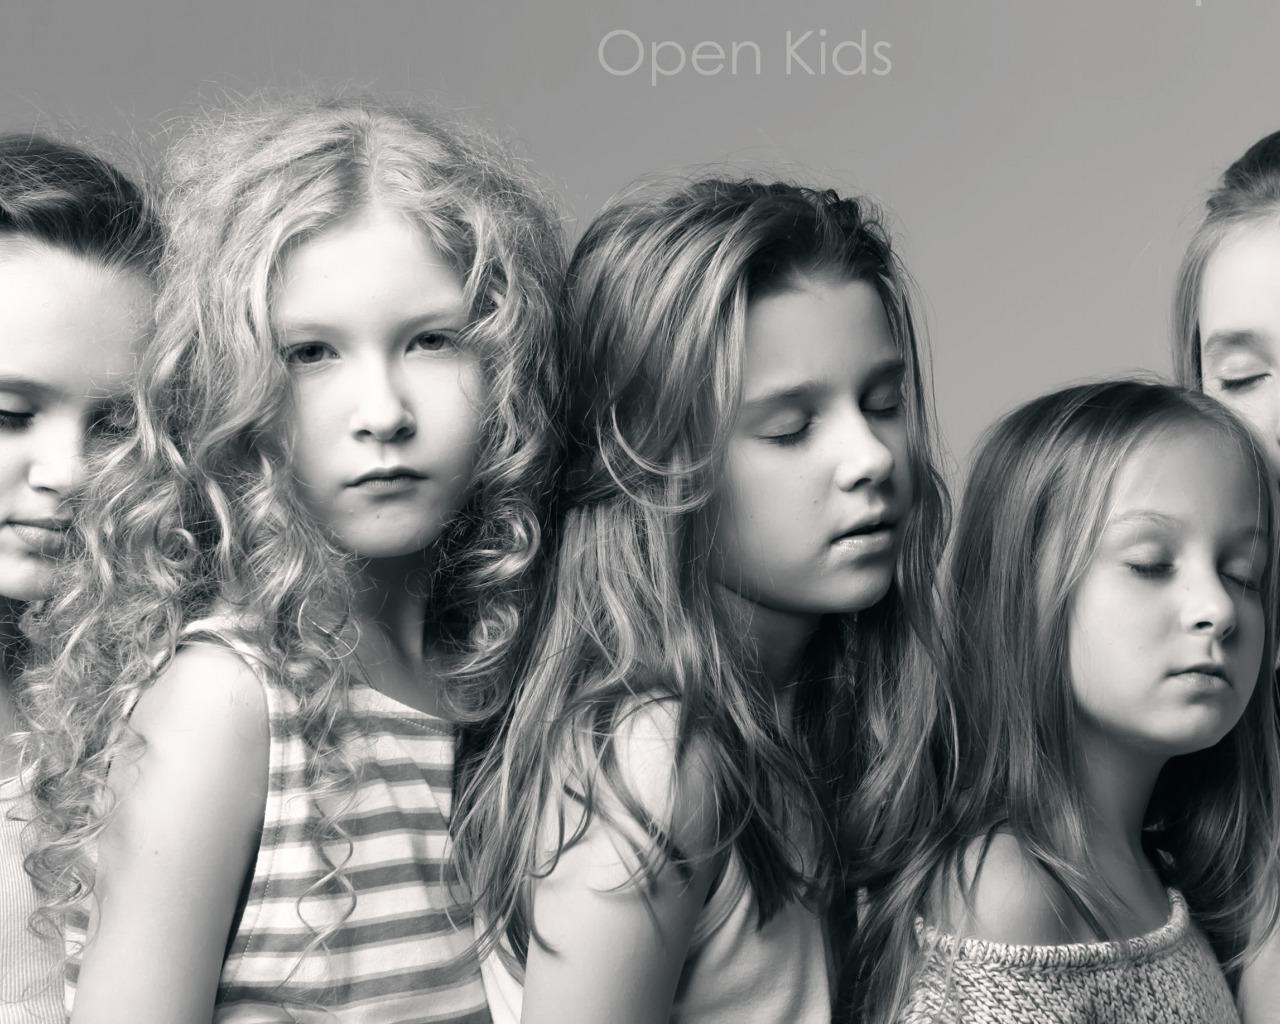 https://img2.goodfon.ru/original/1280x1024/d/5a/open-kids-muzykalnaya-gruppa.jpg